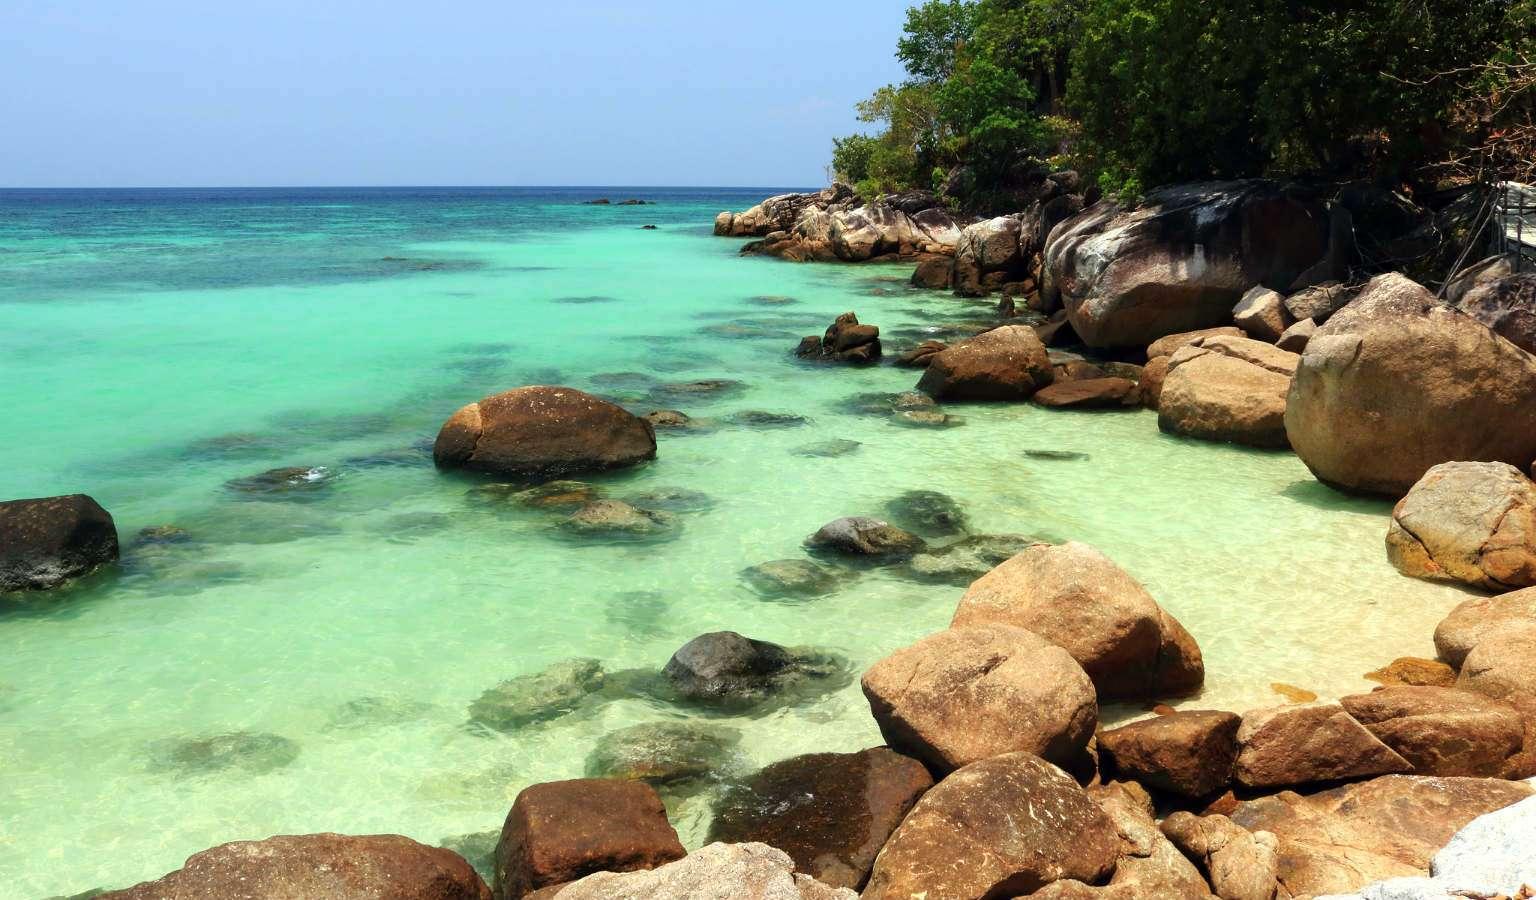 het blauwgroene zeewater van Pattaya Beach in Koh Lipe, Thailand